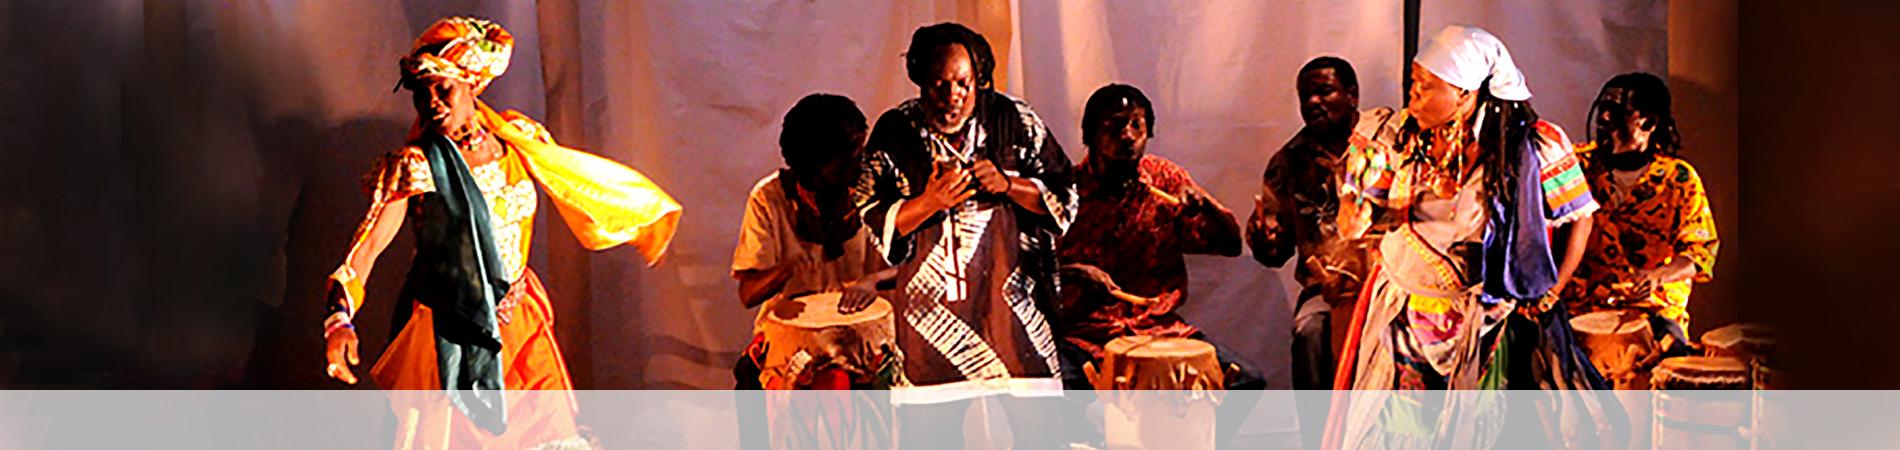 Haitian roots music from Chouk Bwa